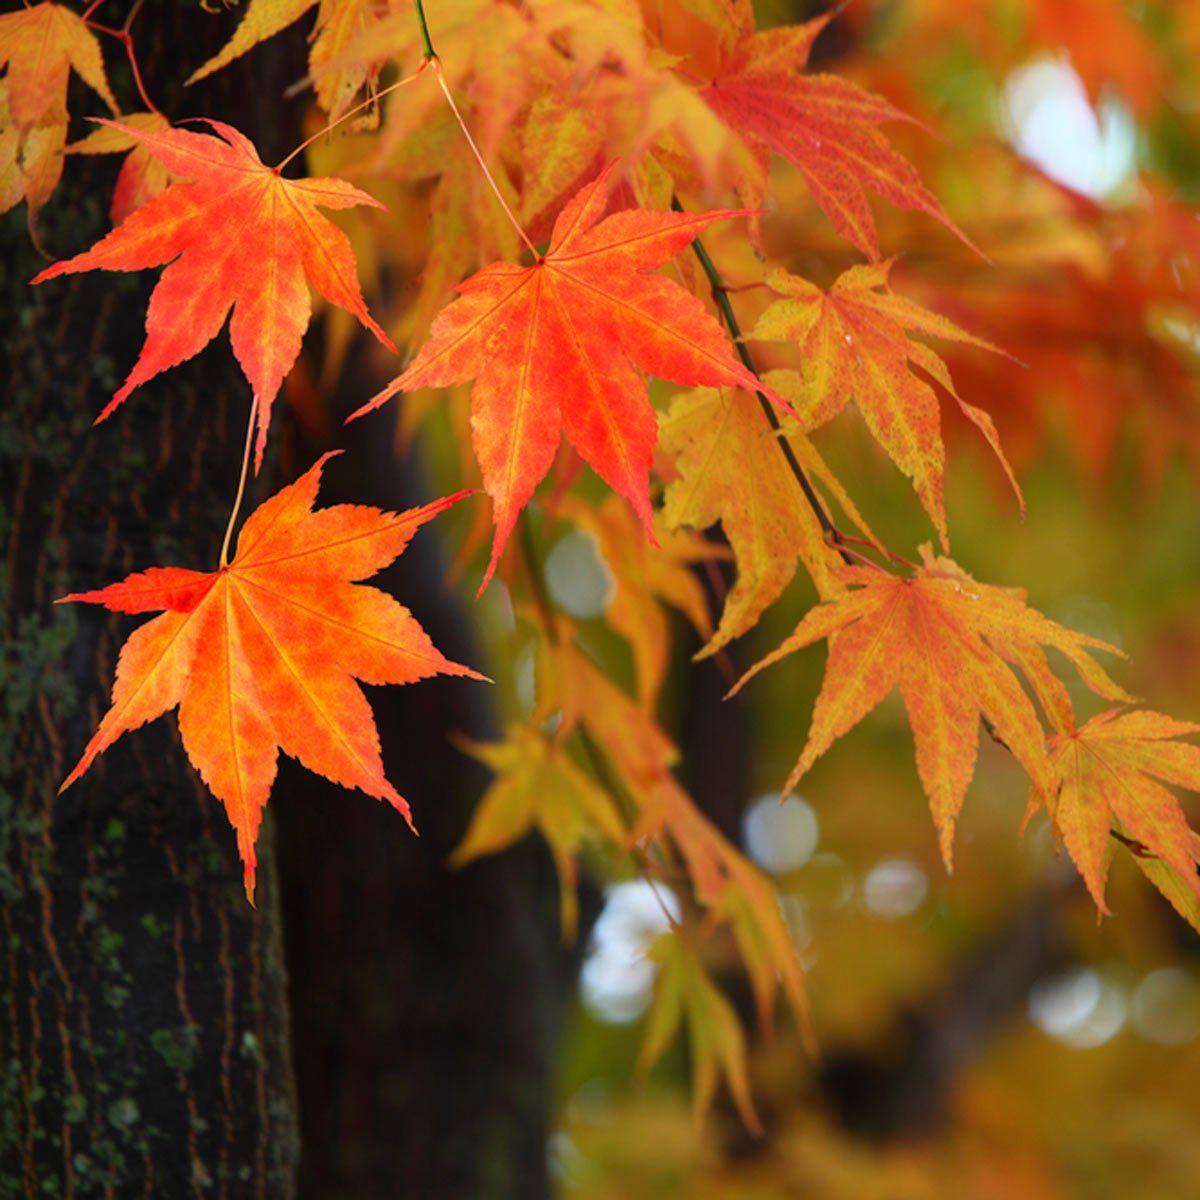 shutterstock_50008510 Japanese maple tree fall foliage leaves